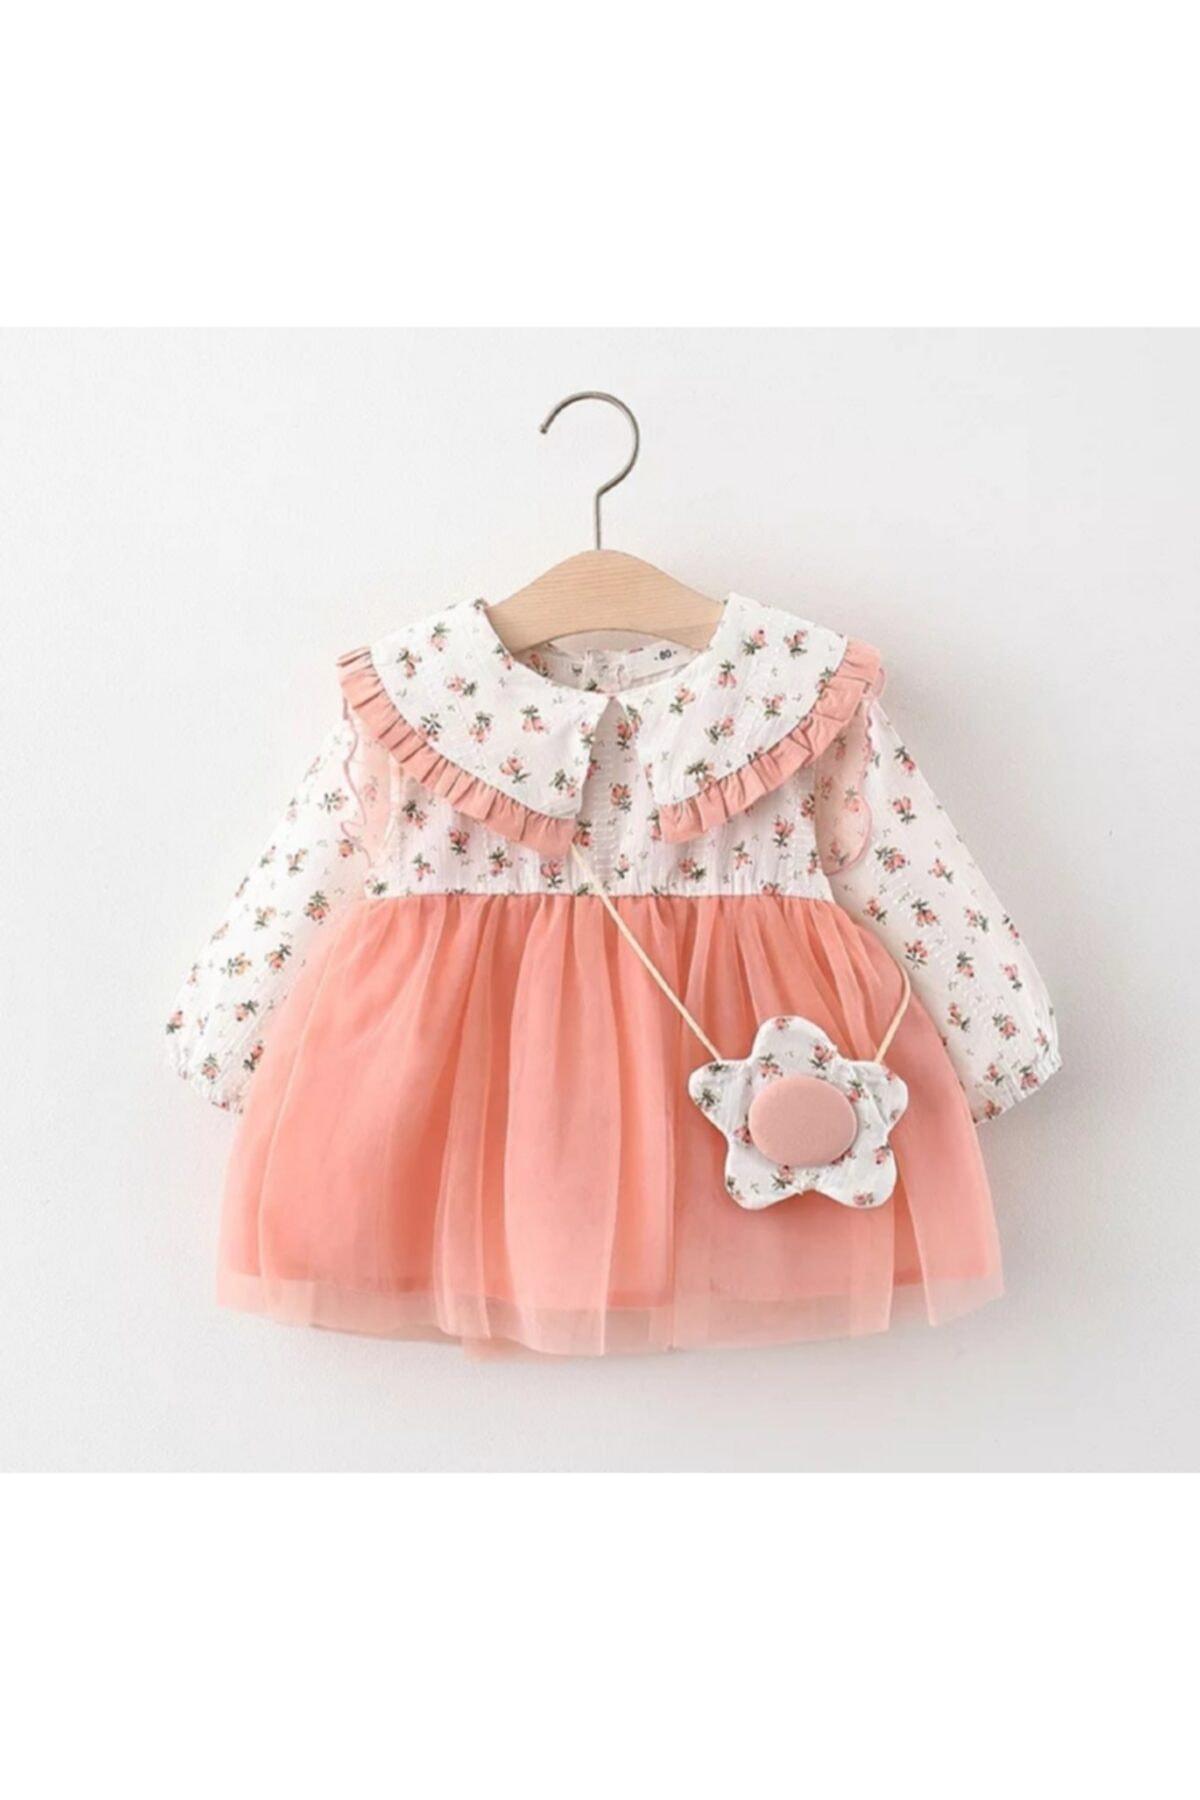 Rosa Floral Botón de vestido de algodón de doble Breasted Regular estándar...